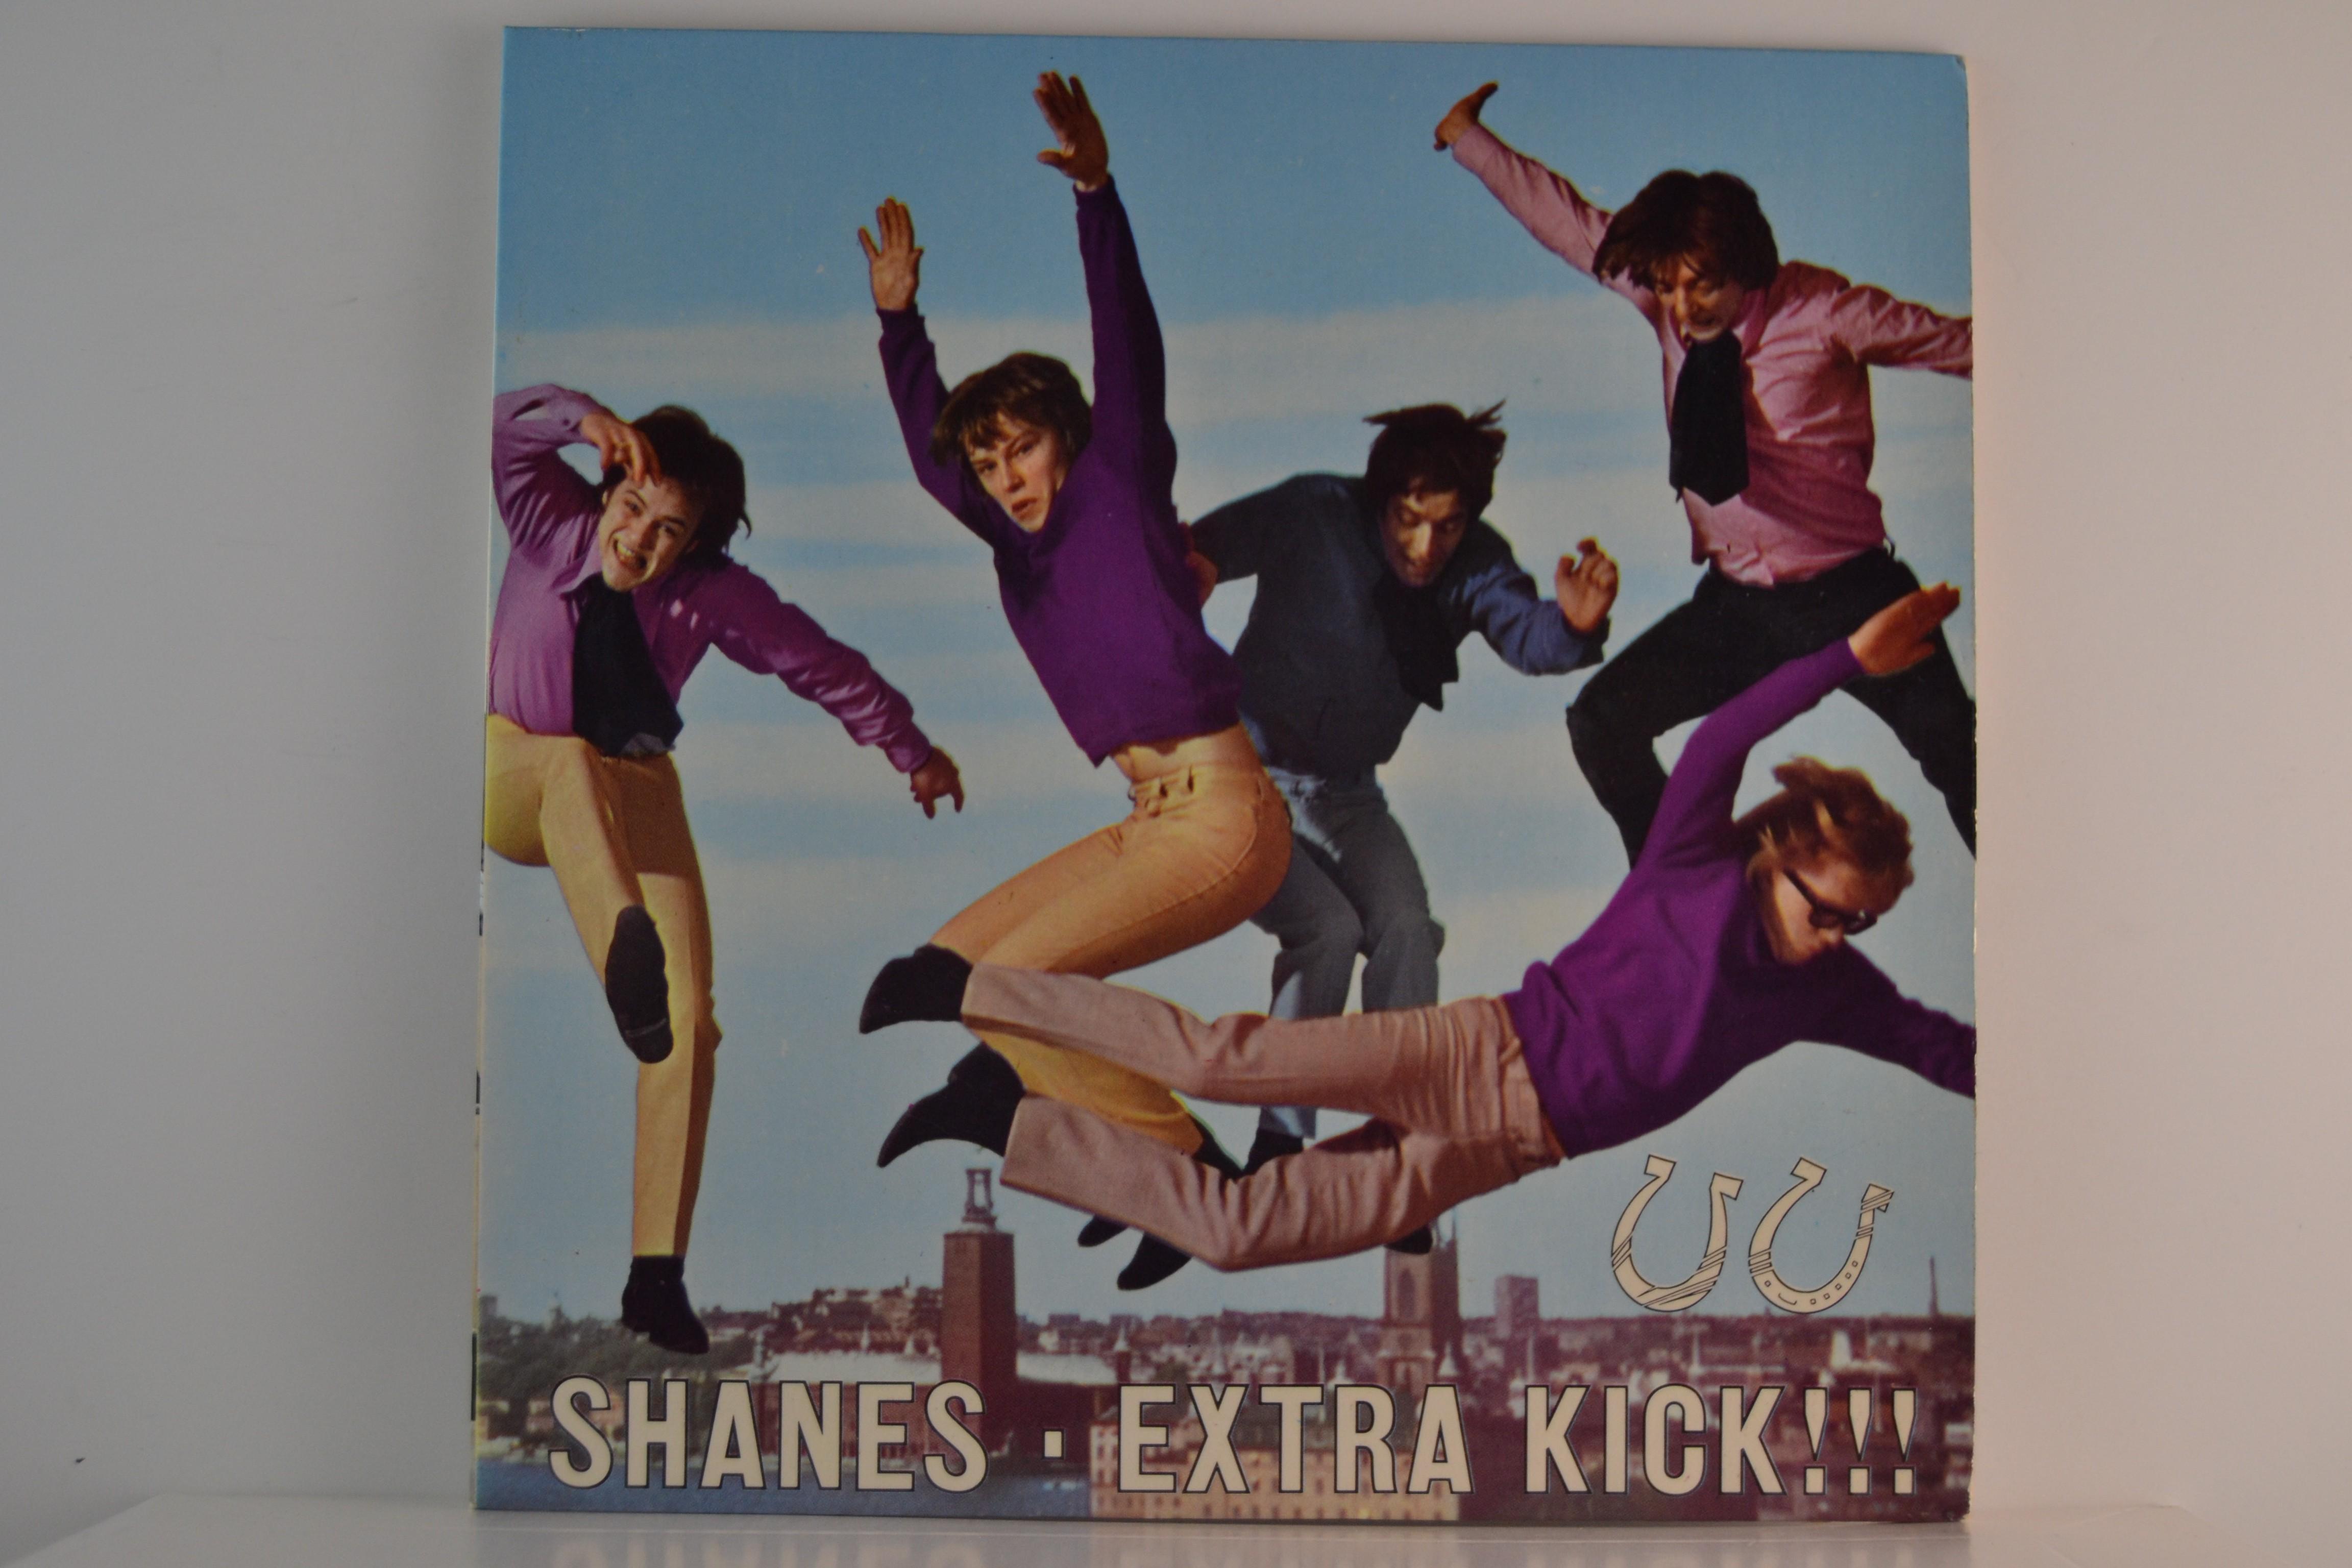 SHANES : Extra kick / No-nox